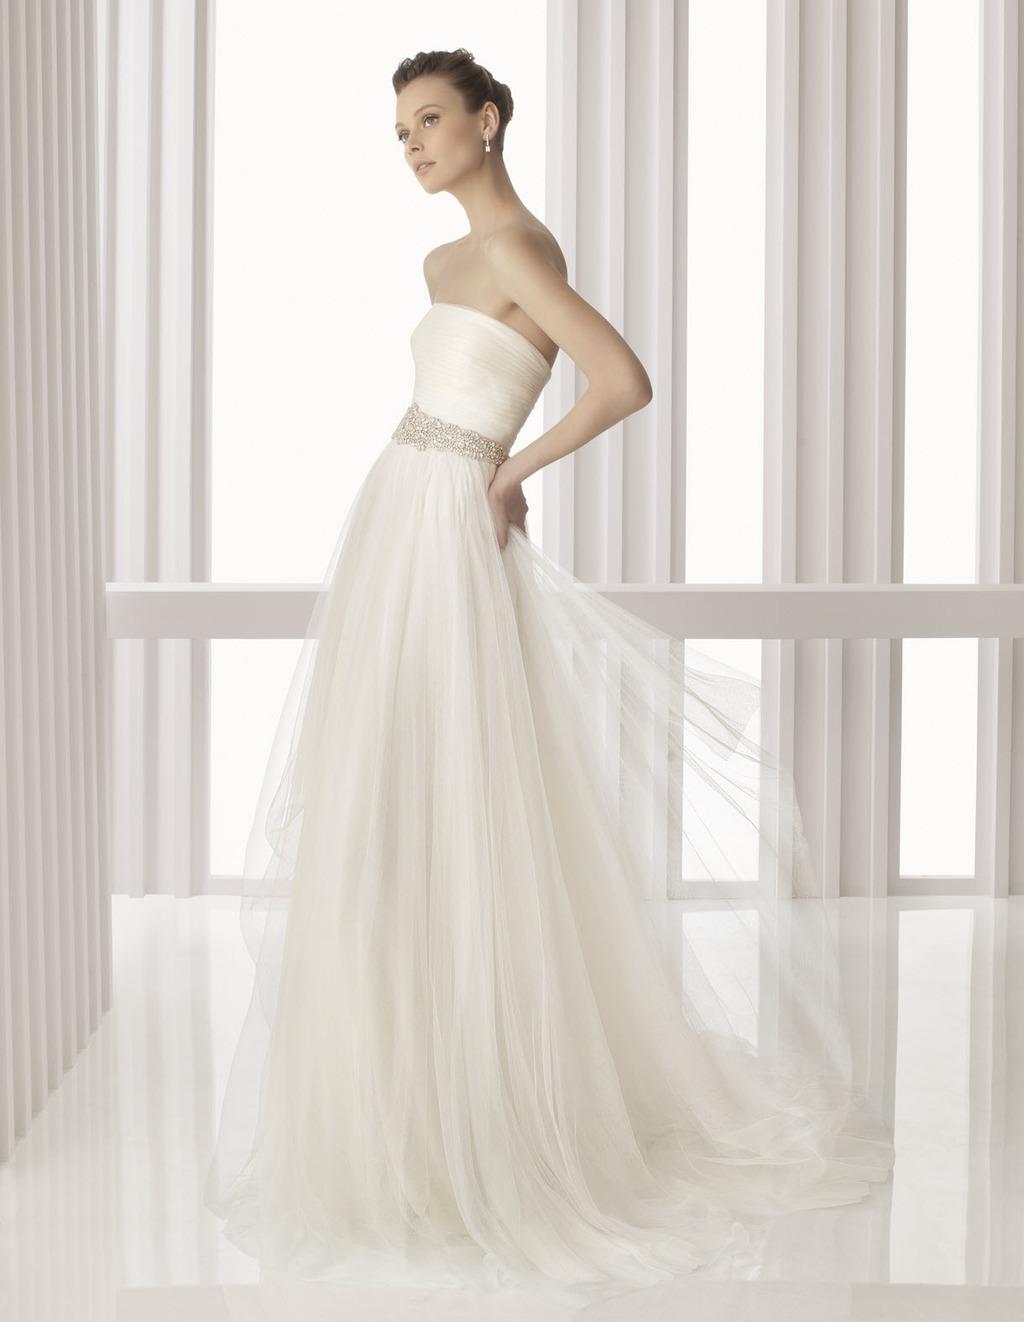 Amina-spring-2012-wedding-dress-rosa-clara-bridal-gowns-strapless-a-line-sheer-tulle-skirt-beaded-bridal-belt.full